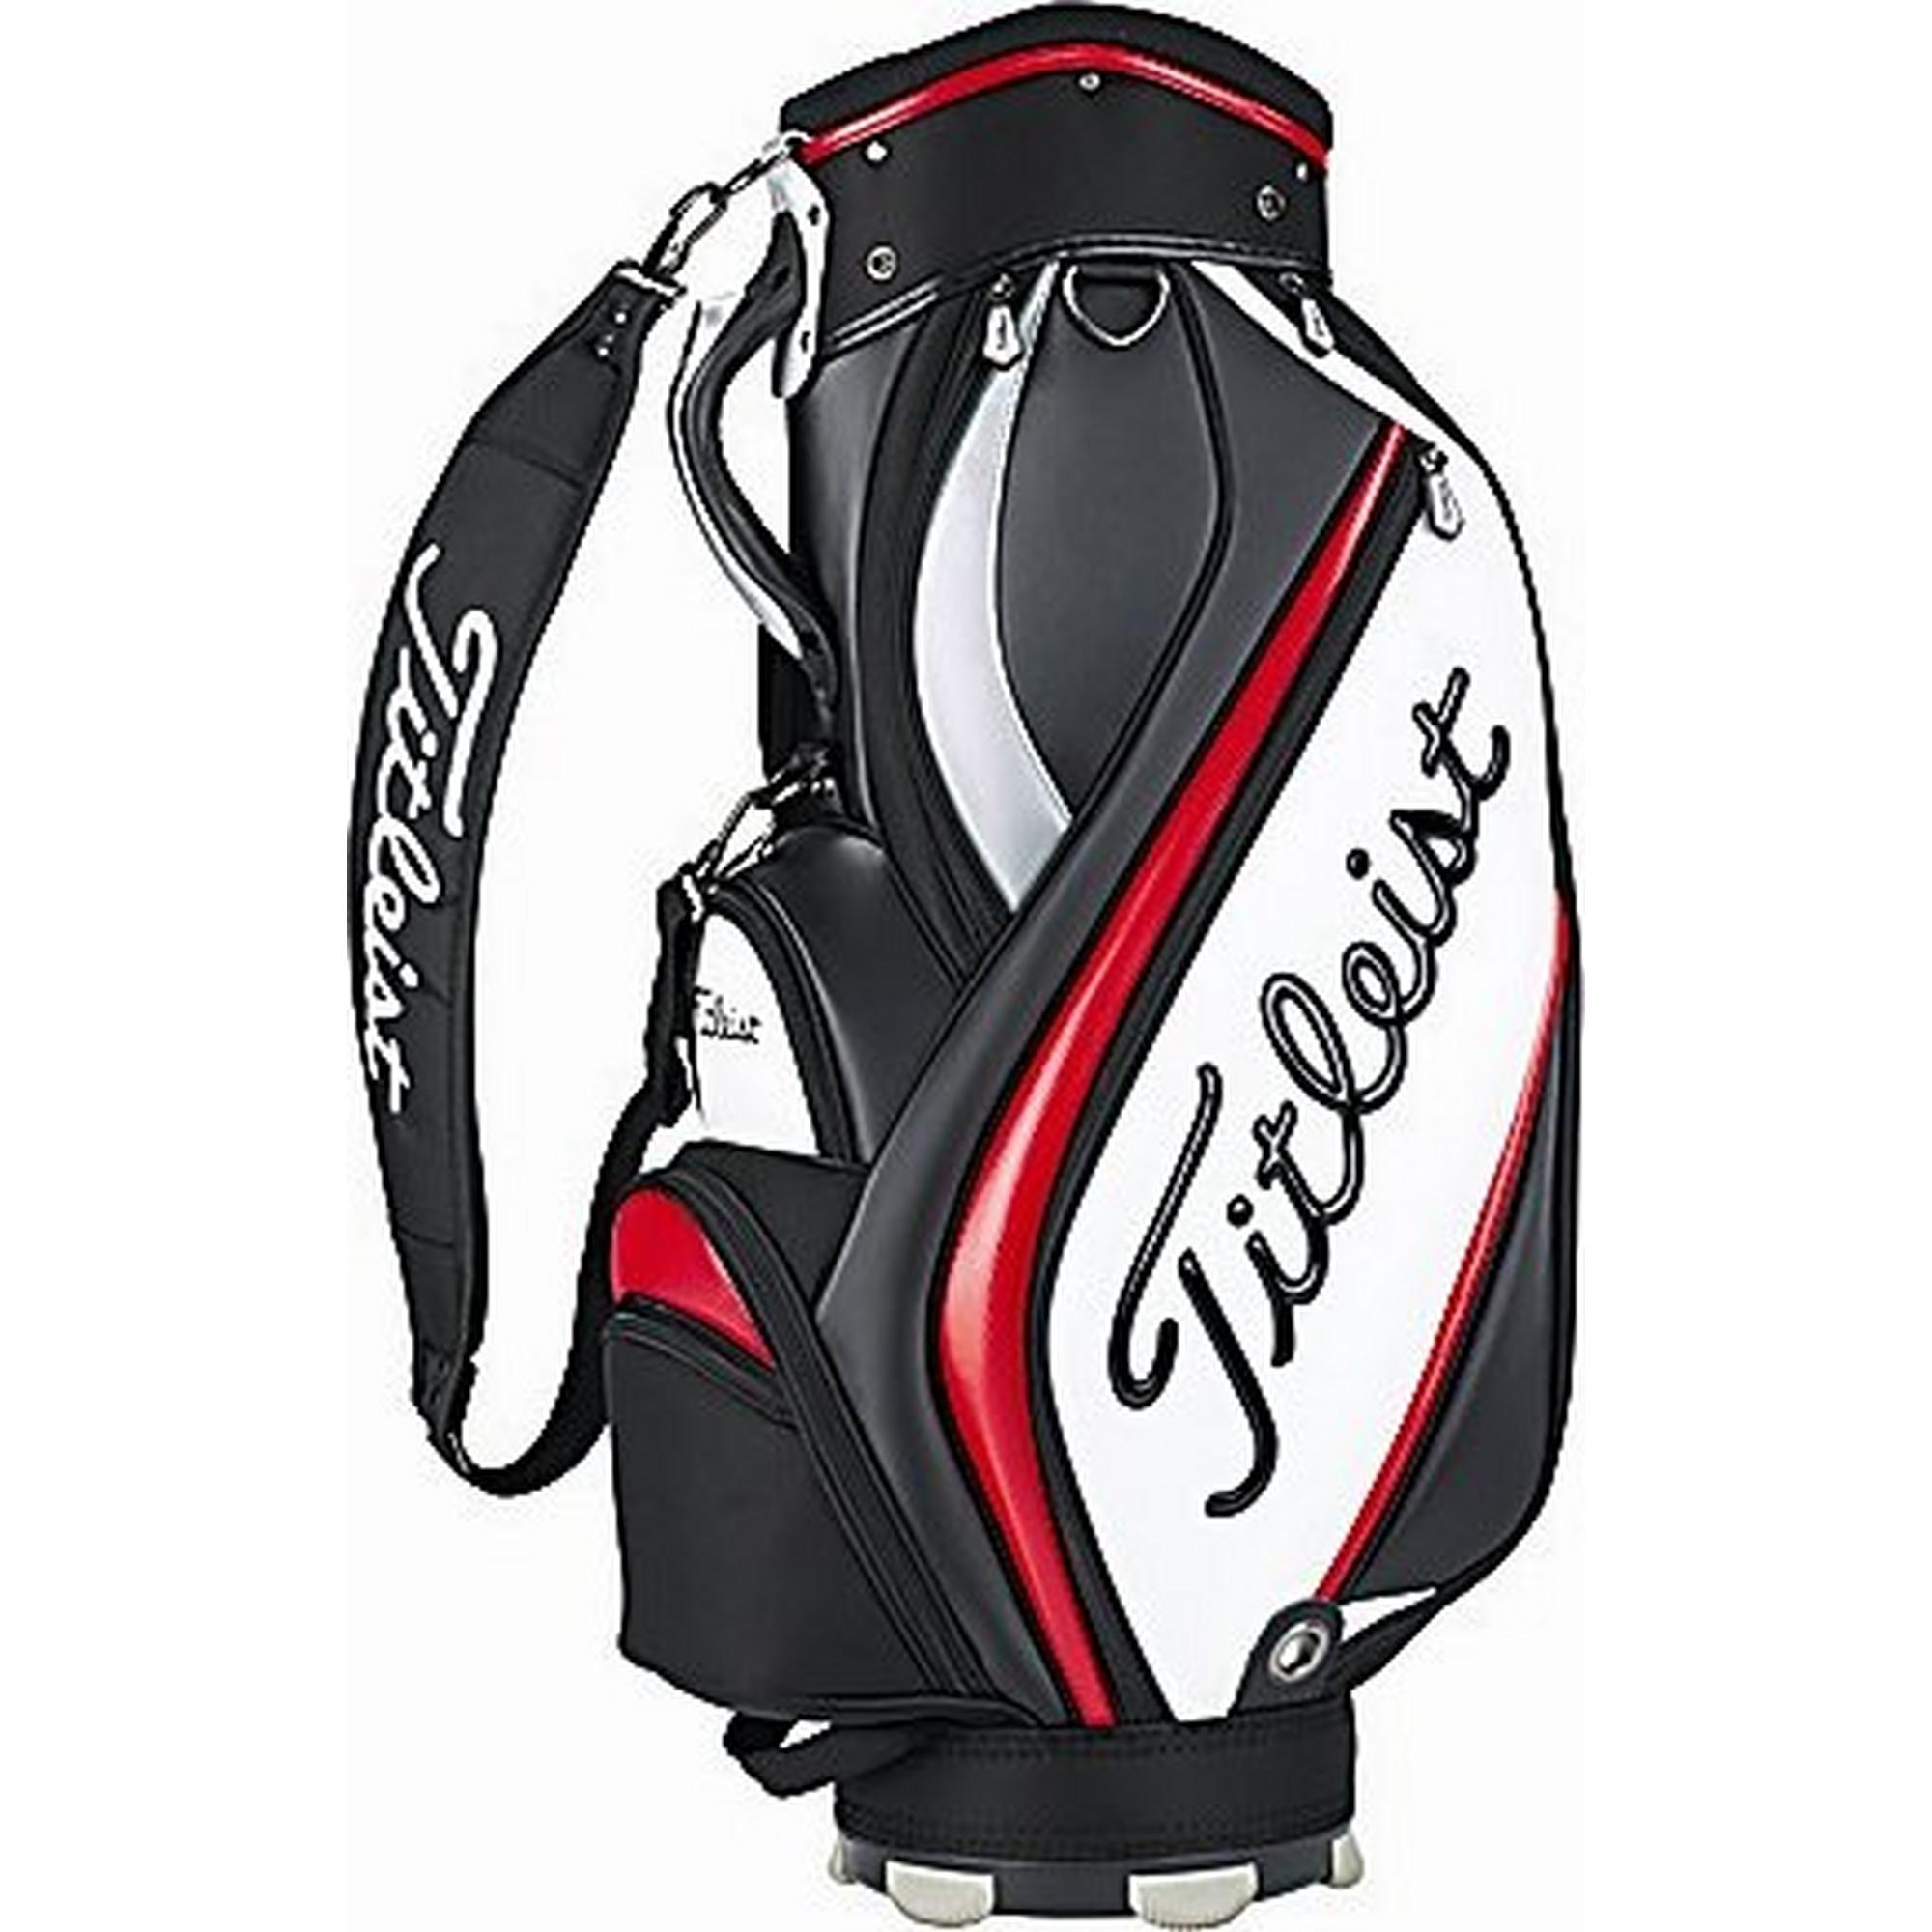 "Mid-Size 9.5"" Staff Bag"